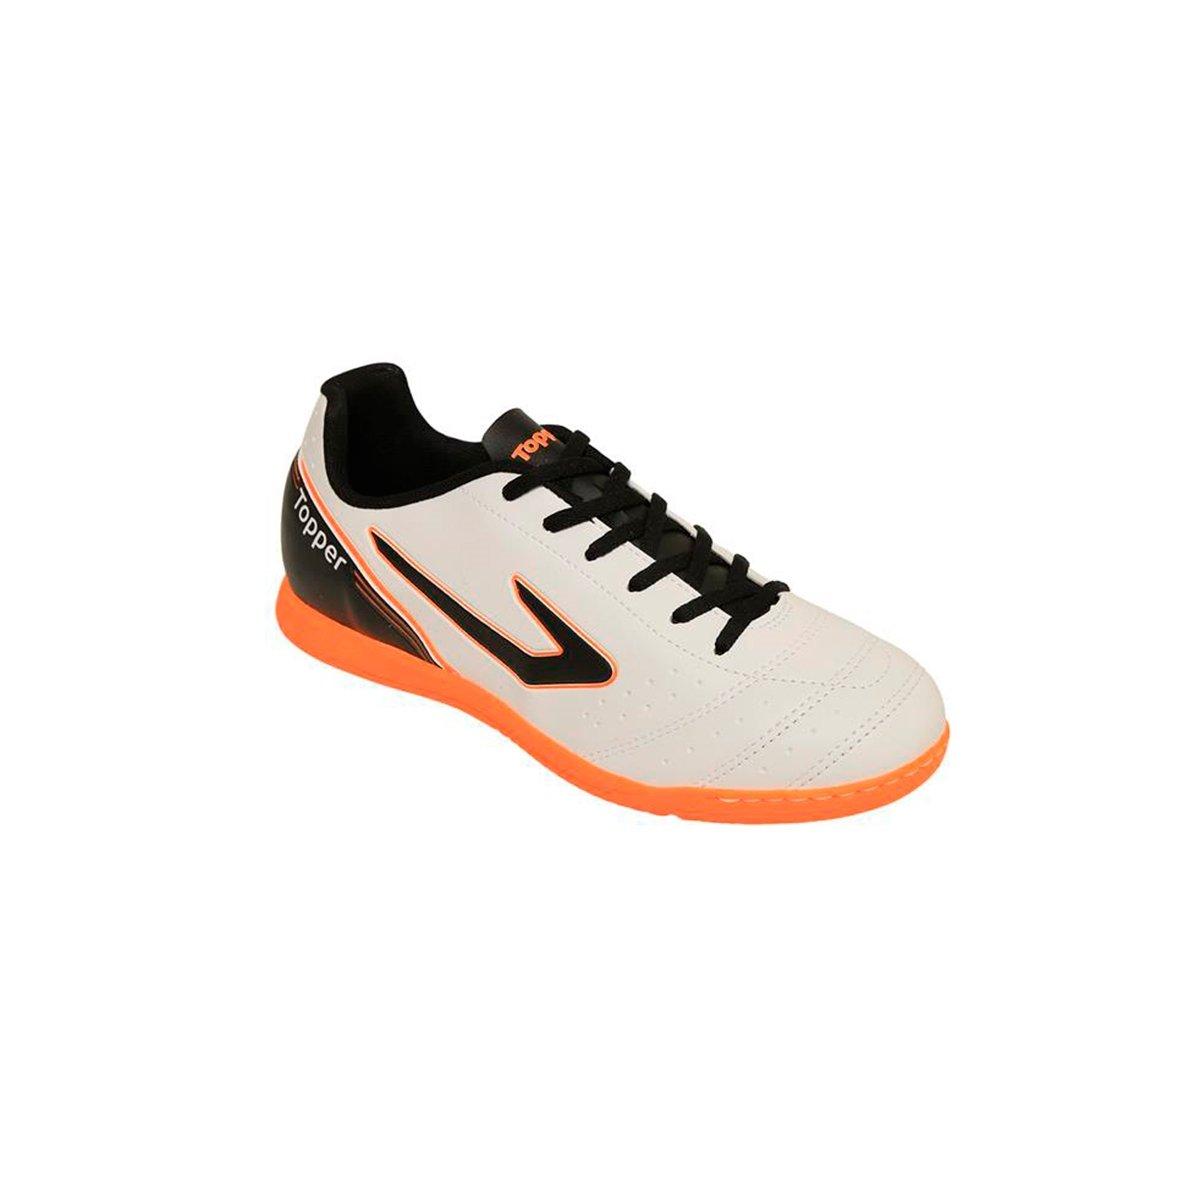 a734f70a6a Chuteira Drible Futsal Topper - Compre Agora